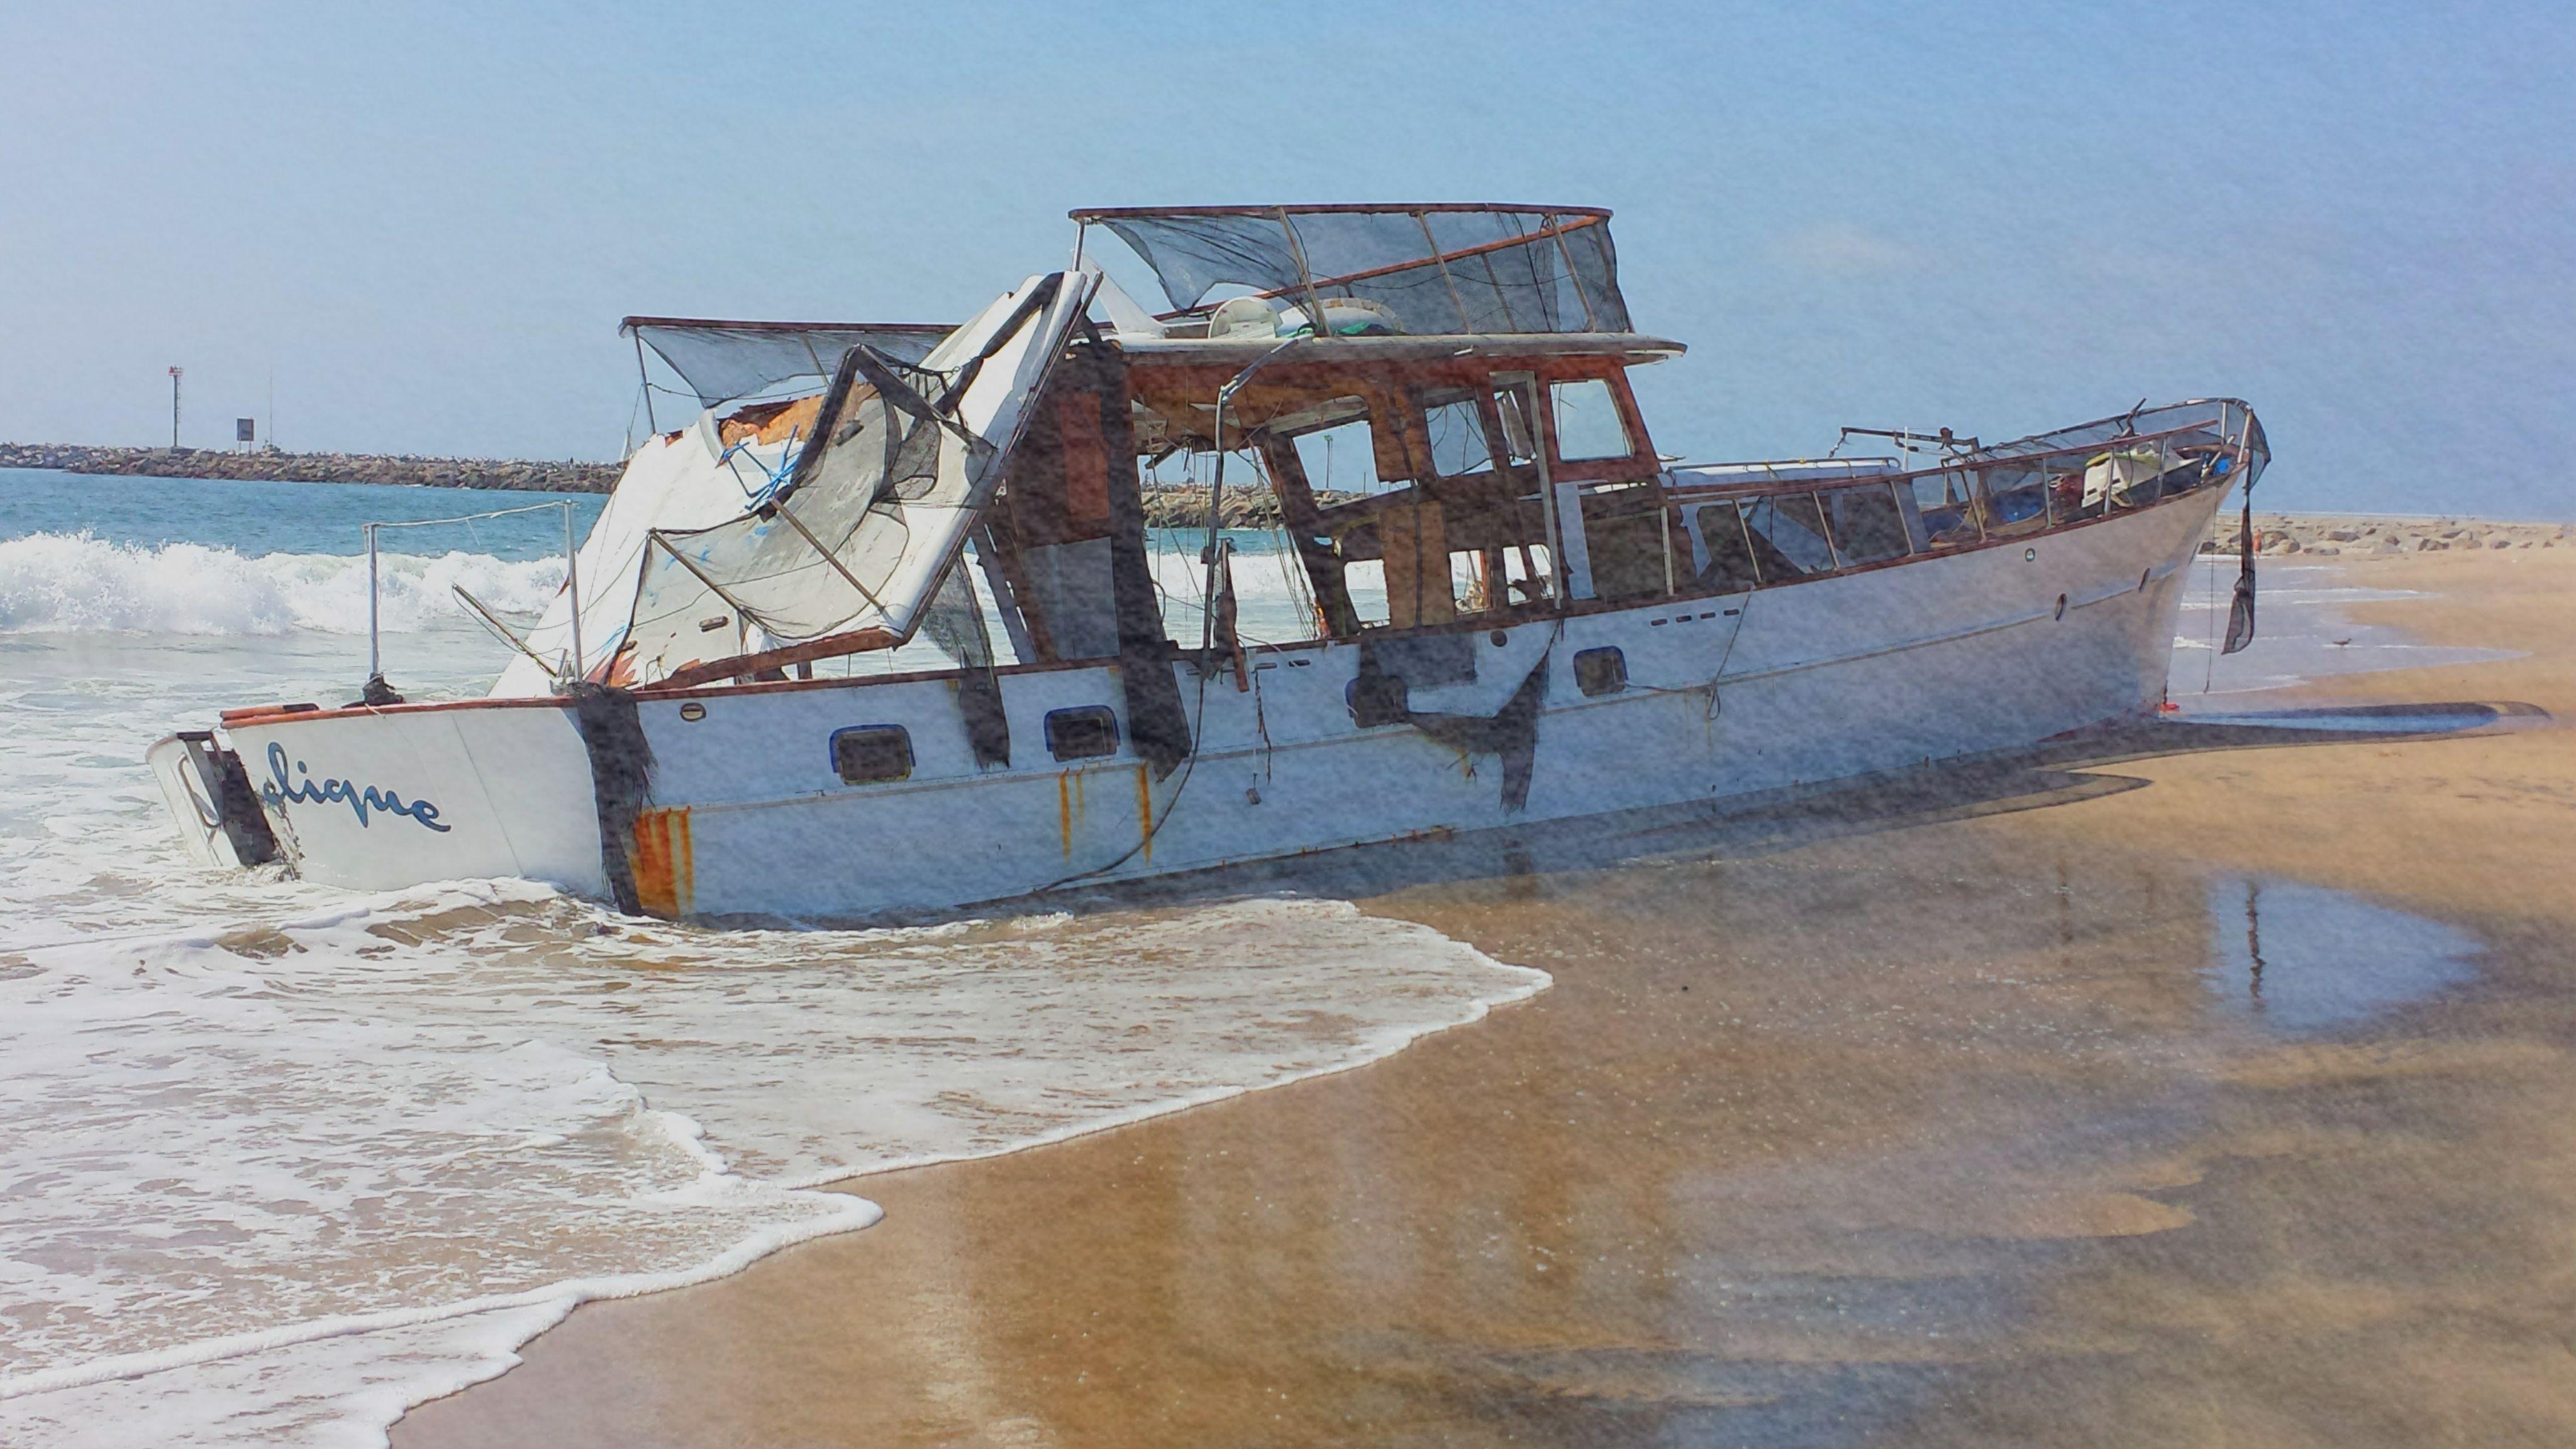 Shipwrecked Playa Del Rey Playa Del Rey Artsy Fartsy Playa